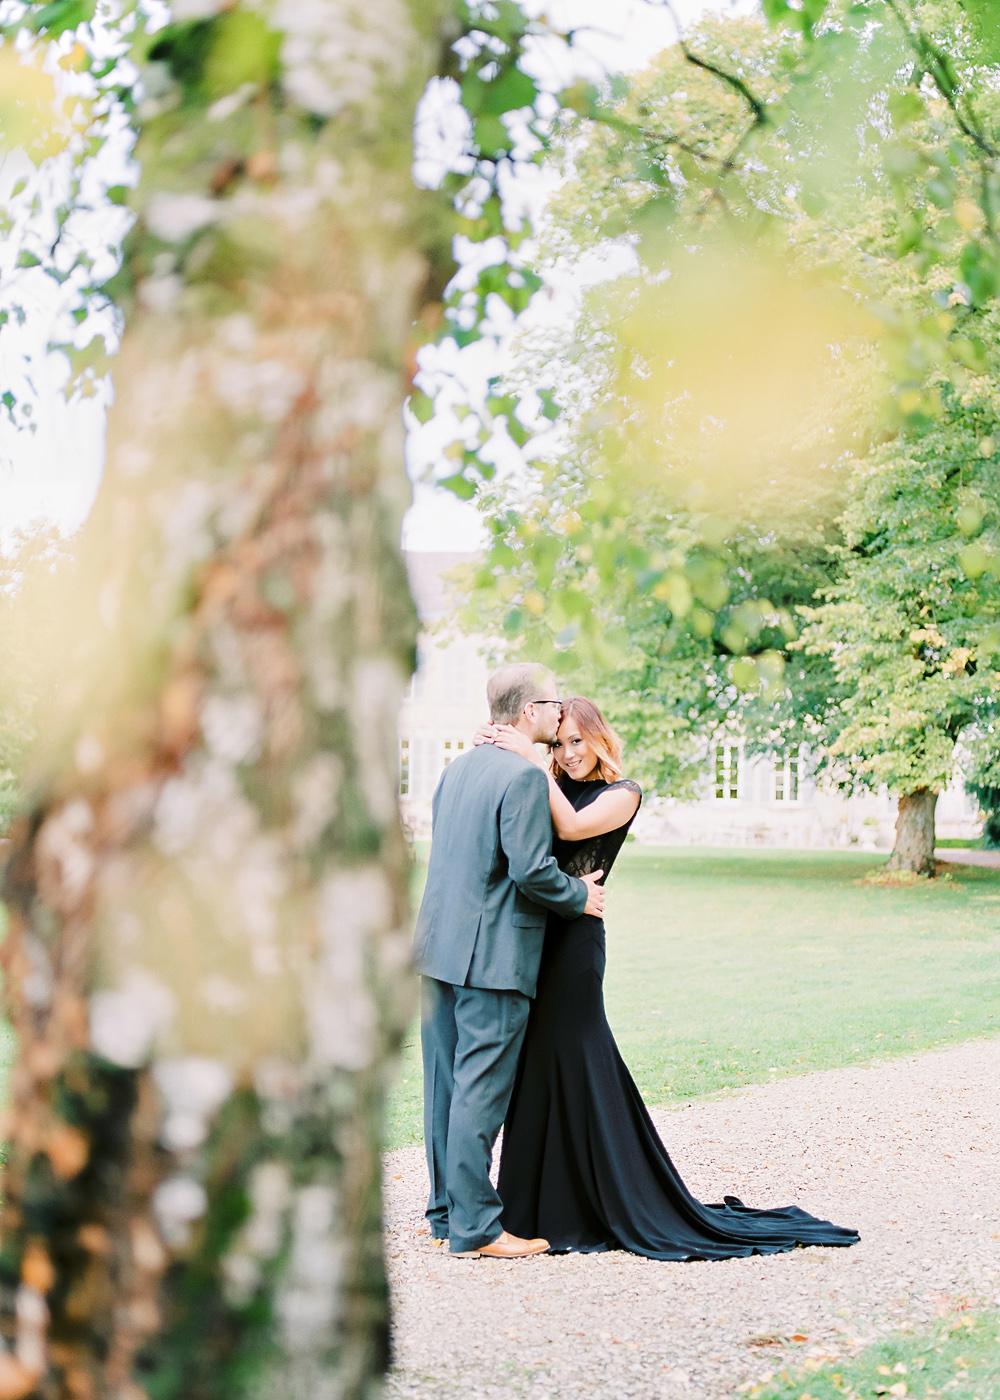 Chateau de Mairy France Anniversary, Anouschka Rokebrand Photography, Fine Art Marriage